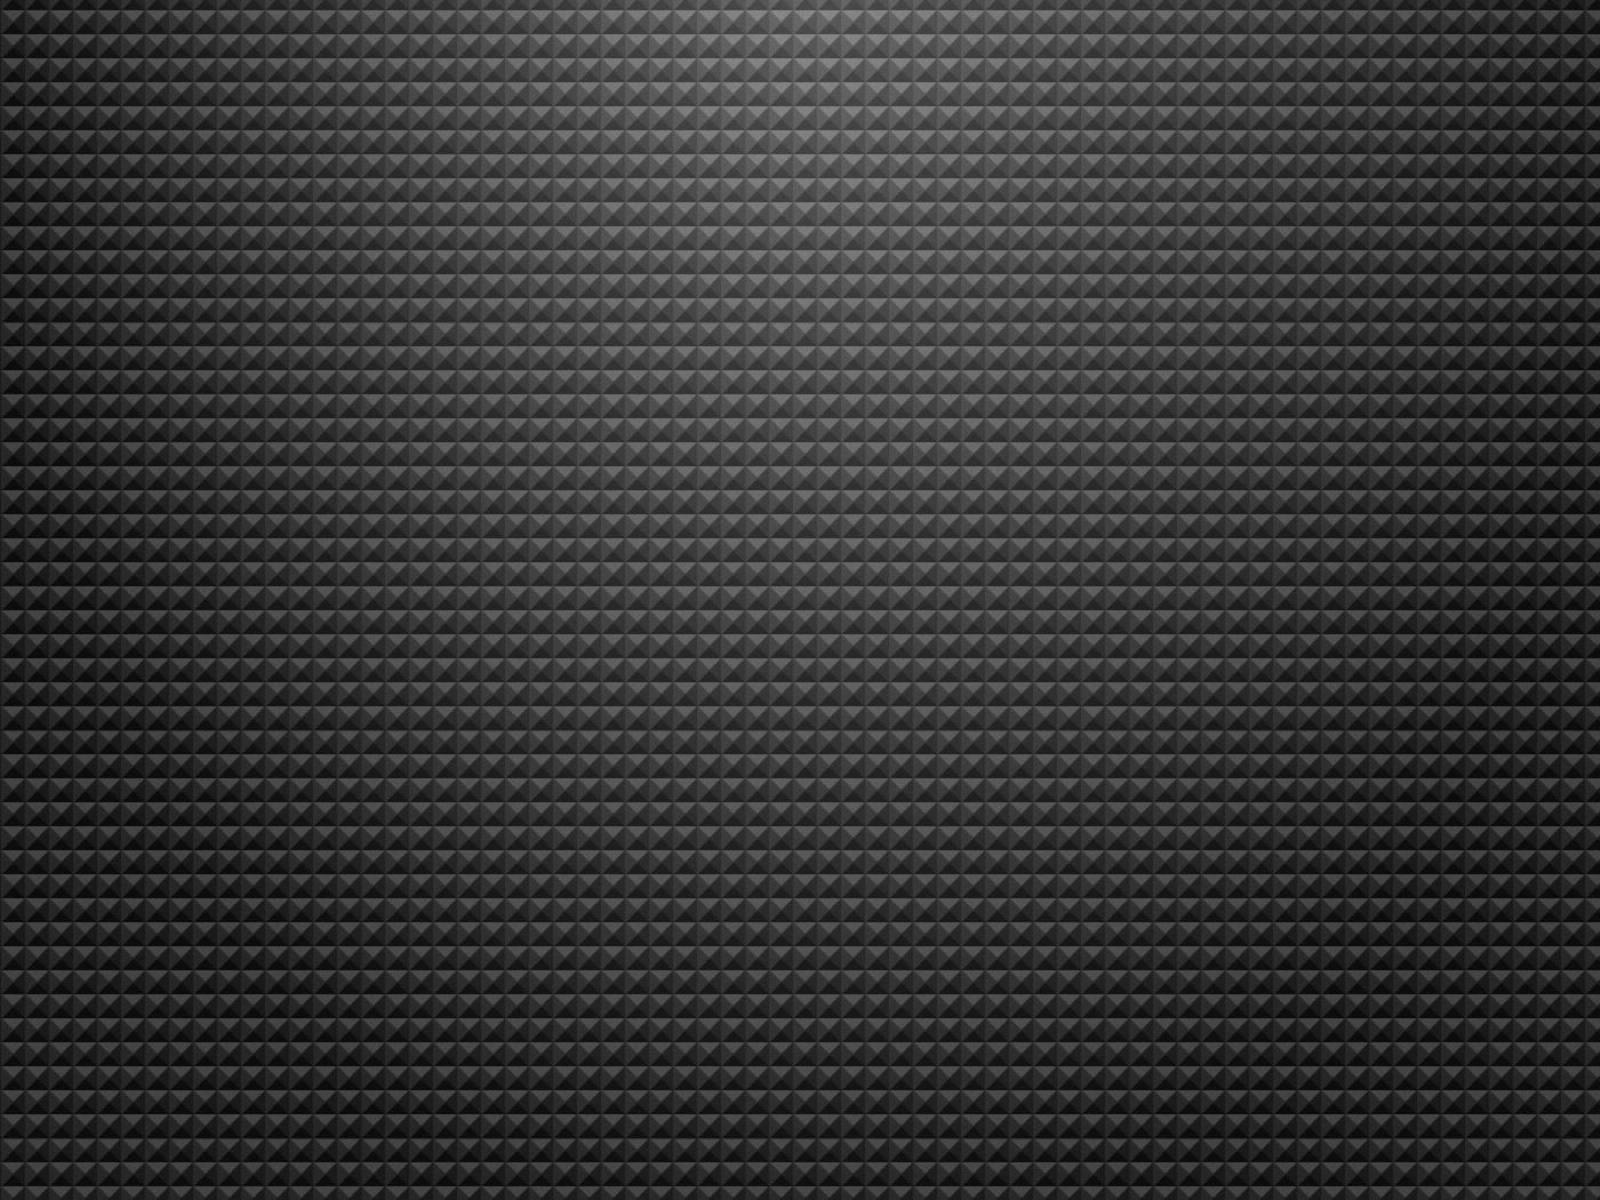 Google Nexus Clean wallpapers | Google Nexus Clean stock photos